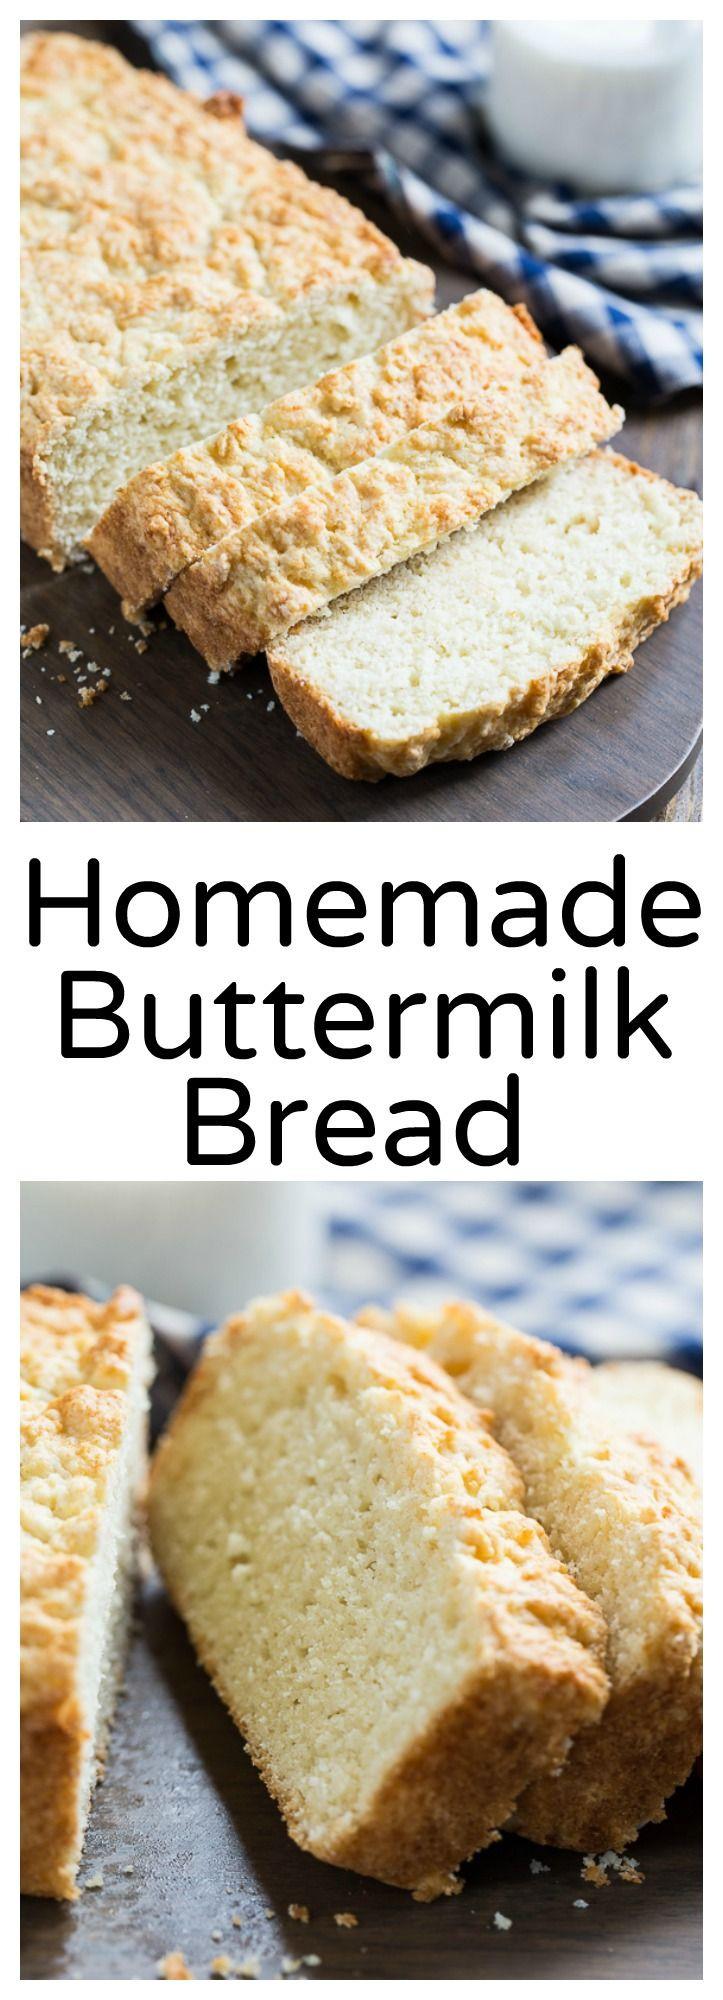 Quick Yeast Bread Recipes  Best 25 No yeast bread ideas on Pinterest